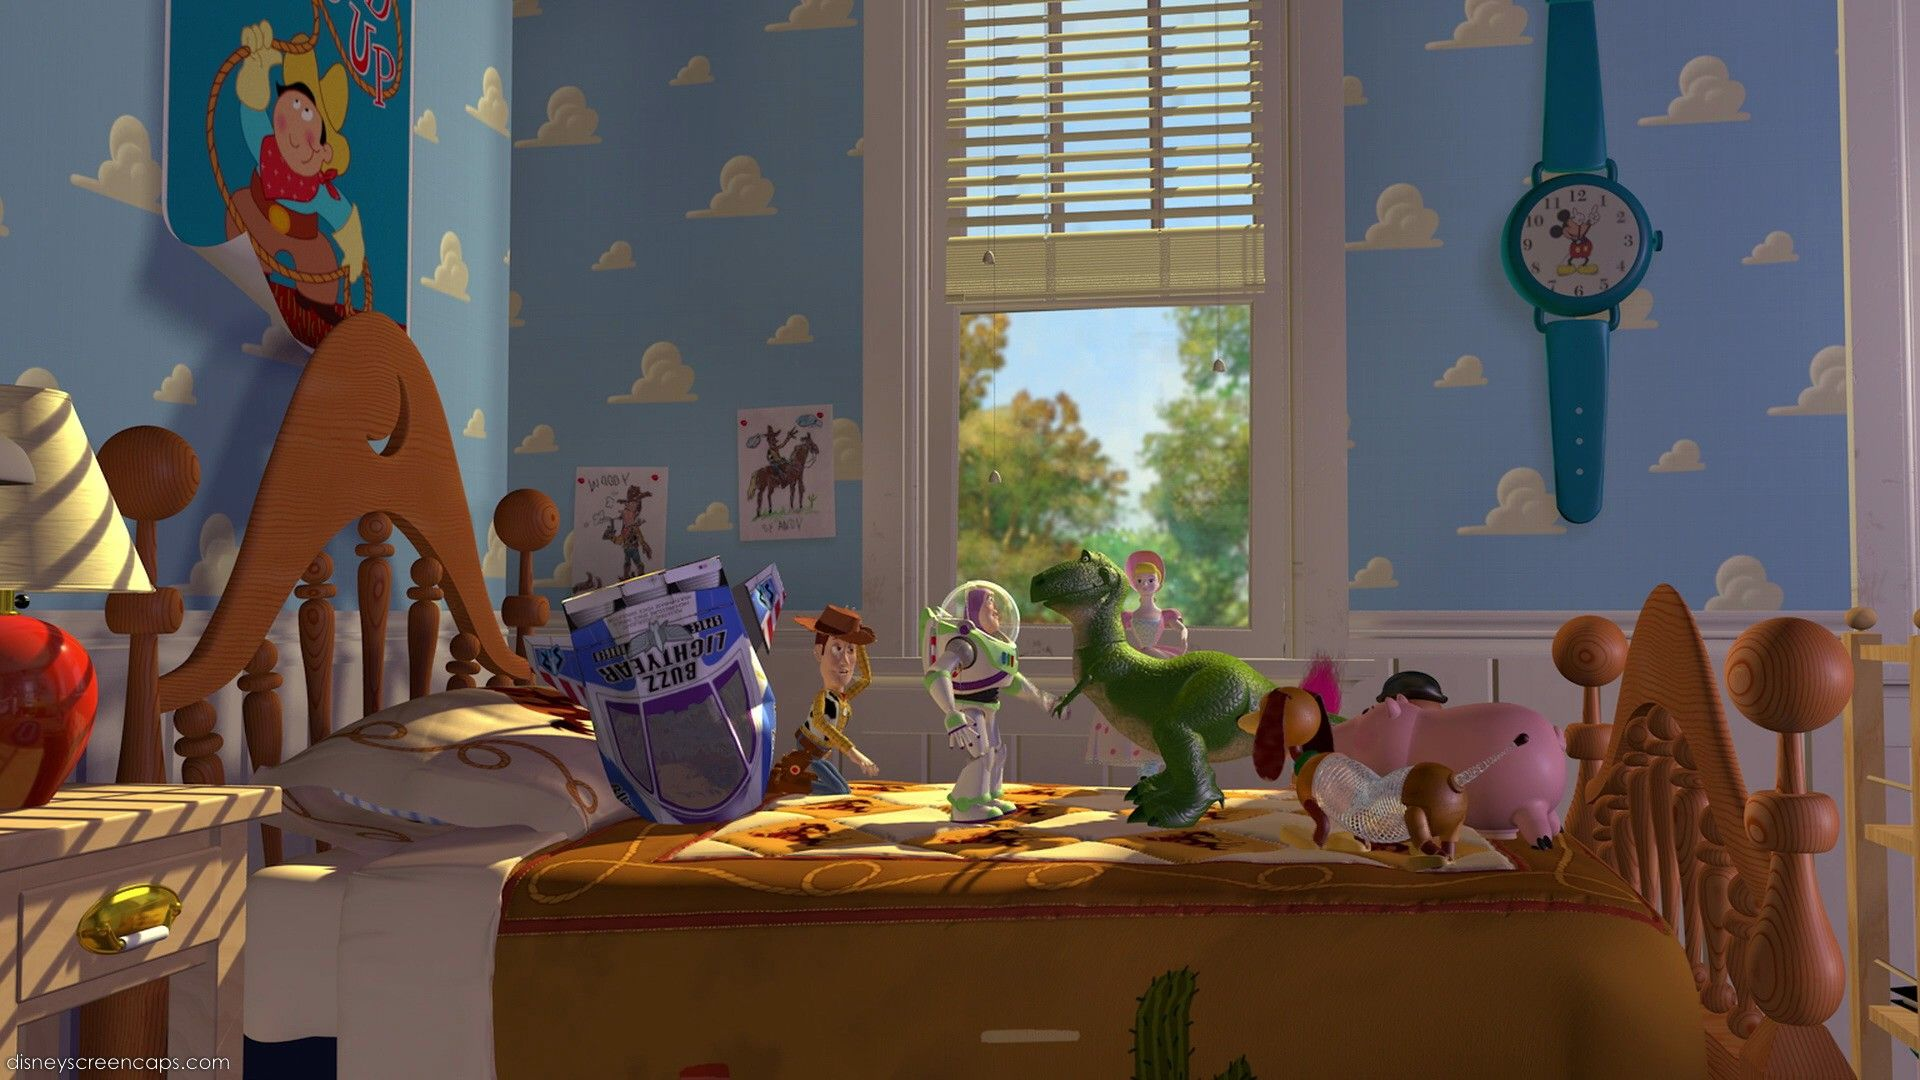 Latest 1920 215 1080 Toy Story Pinterest Disney Images